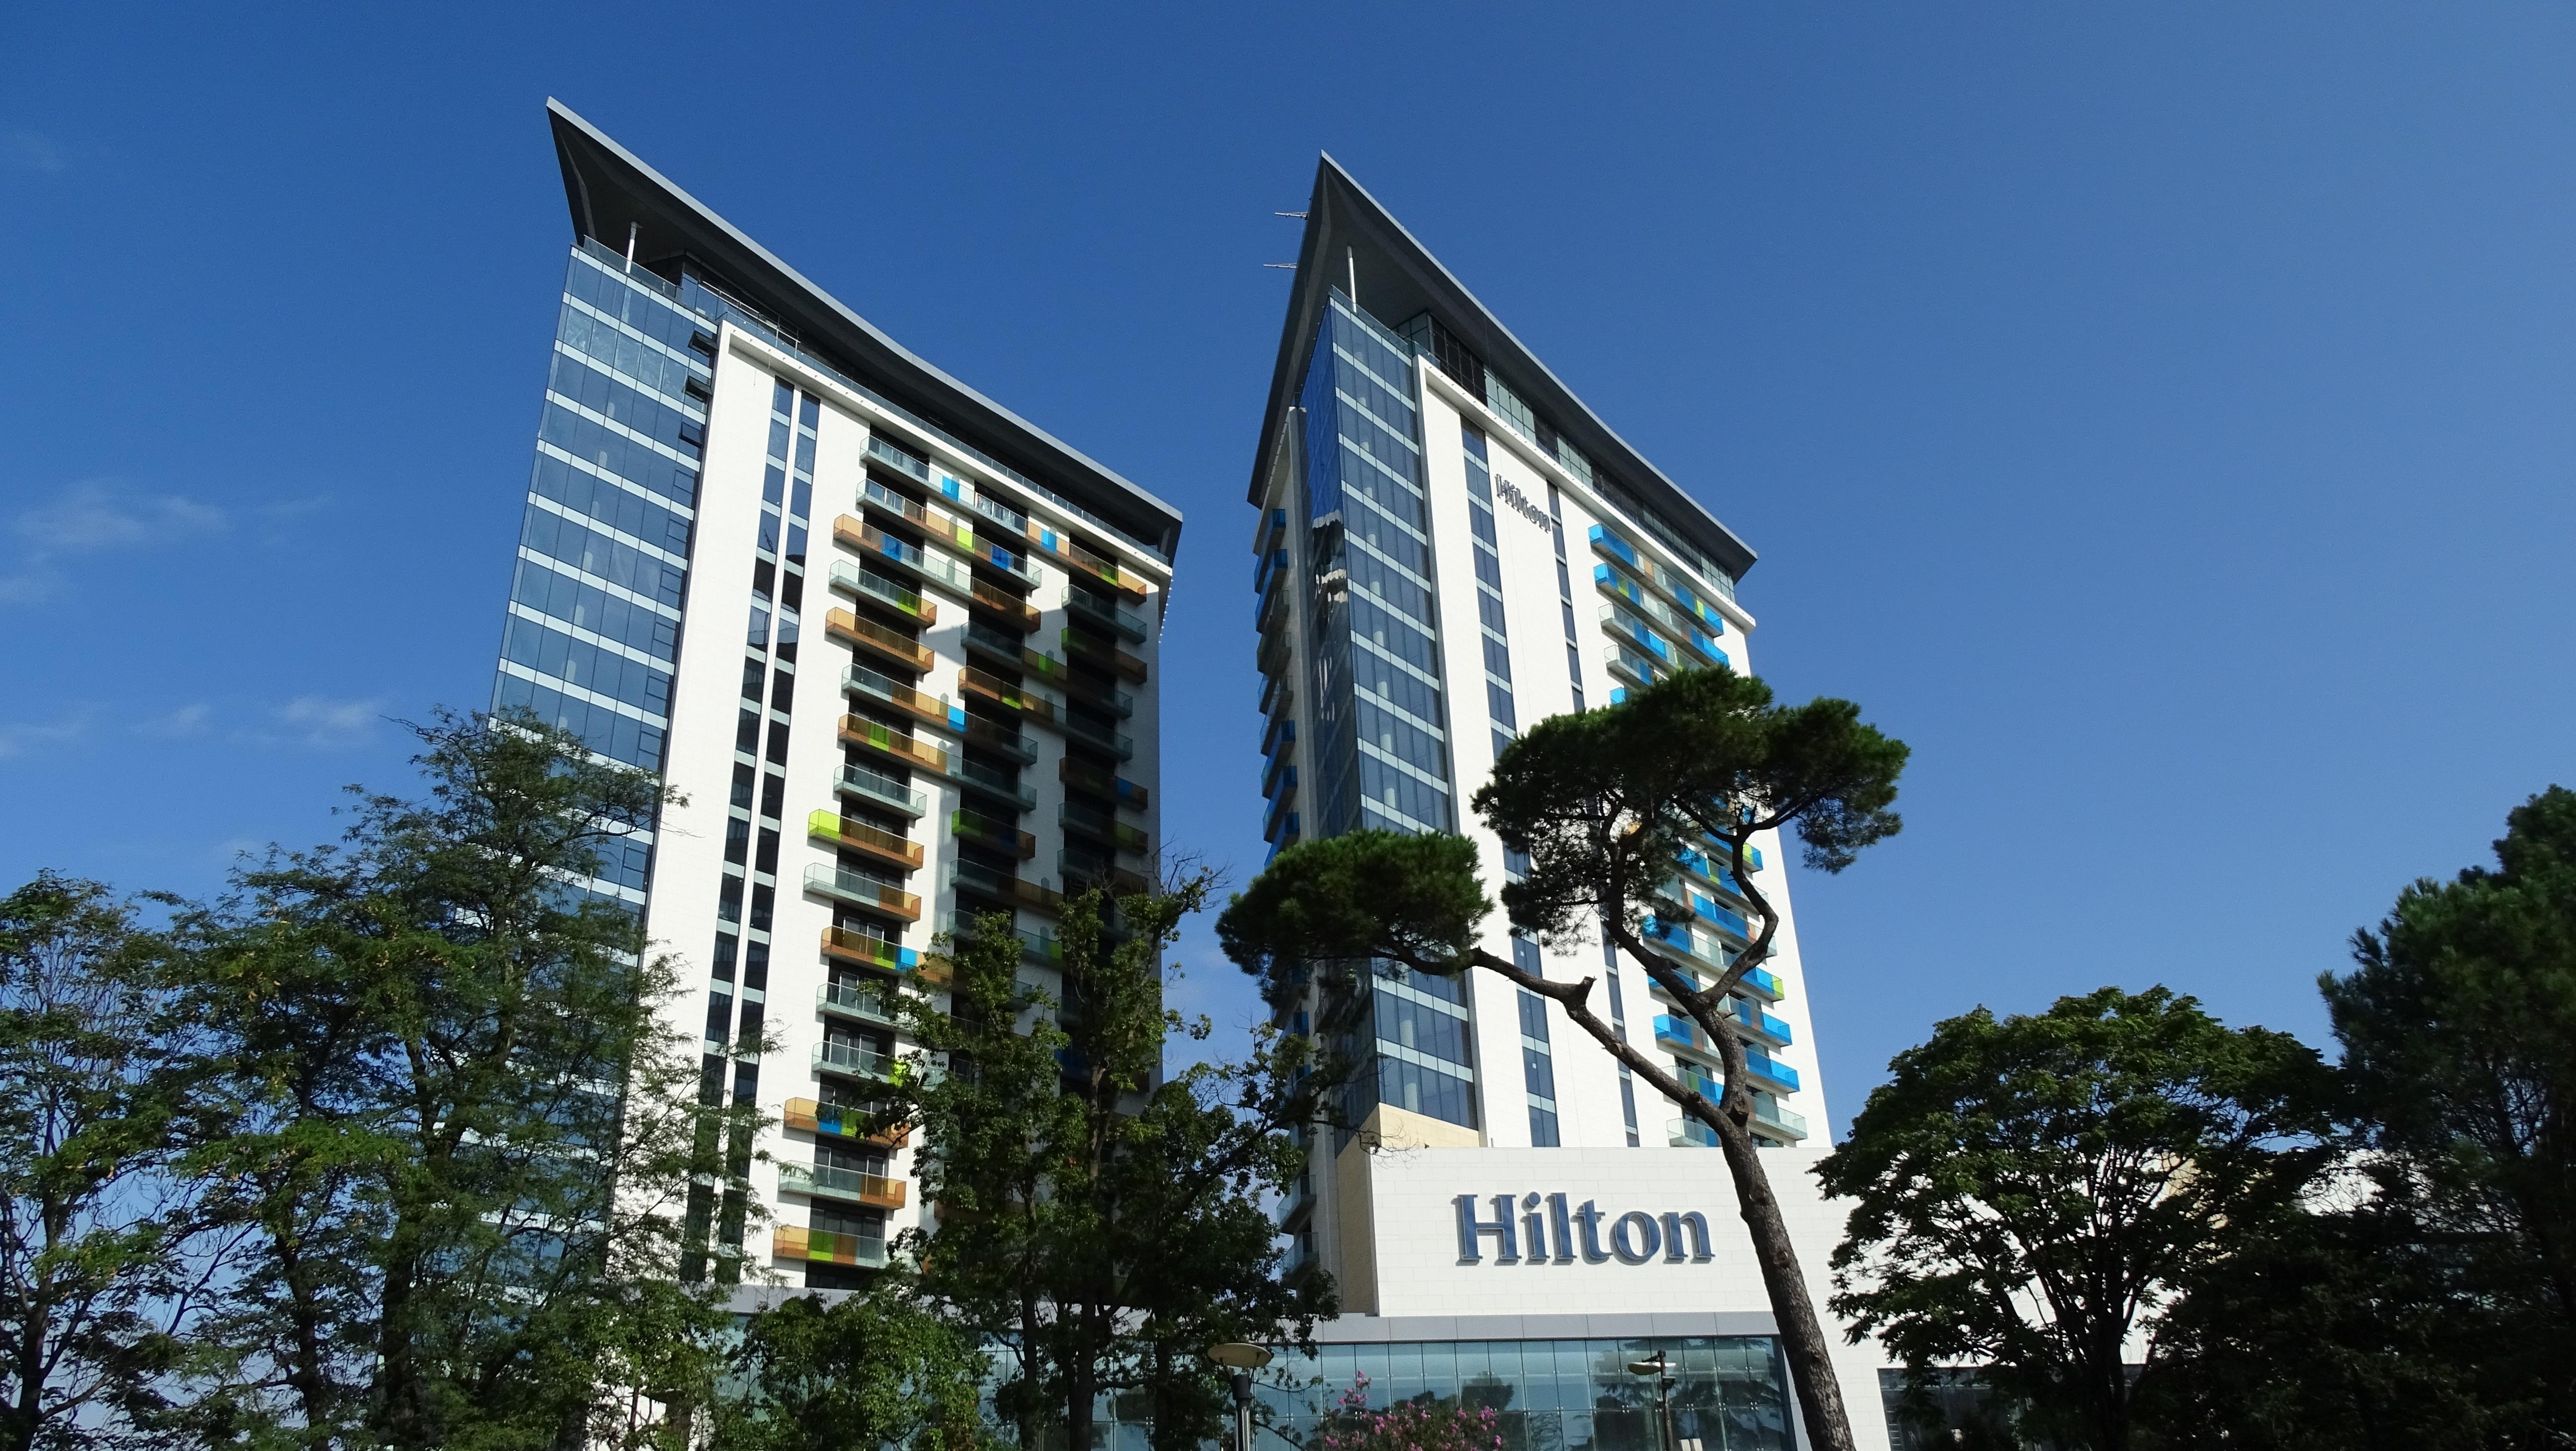 New Radisson Promotion and Hilton Welcome Bonus